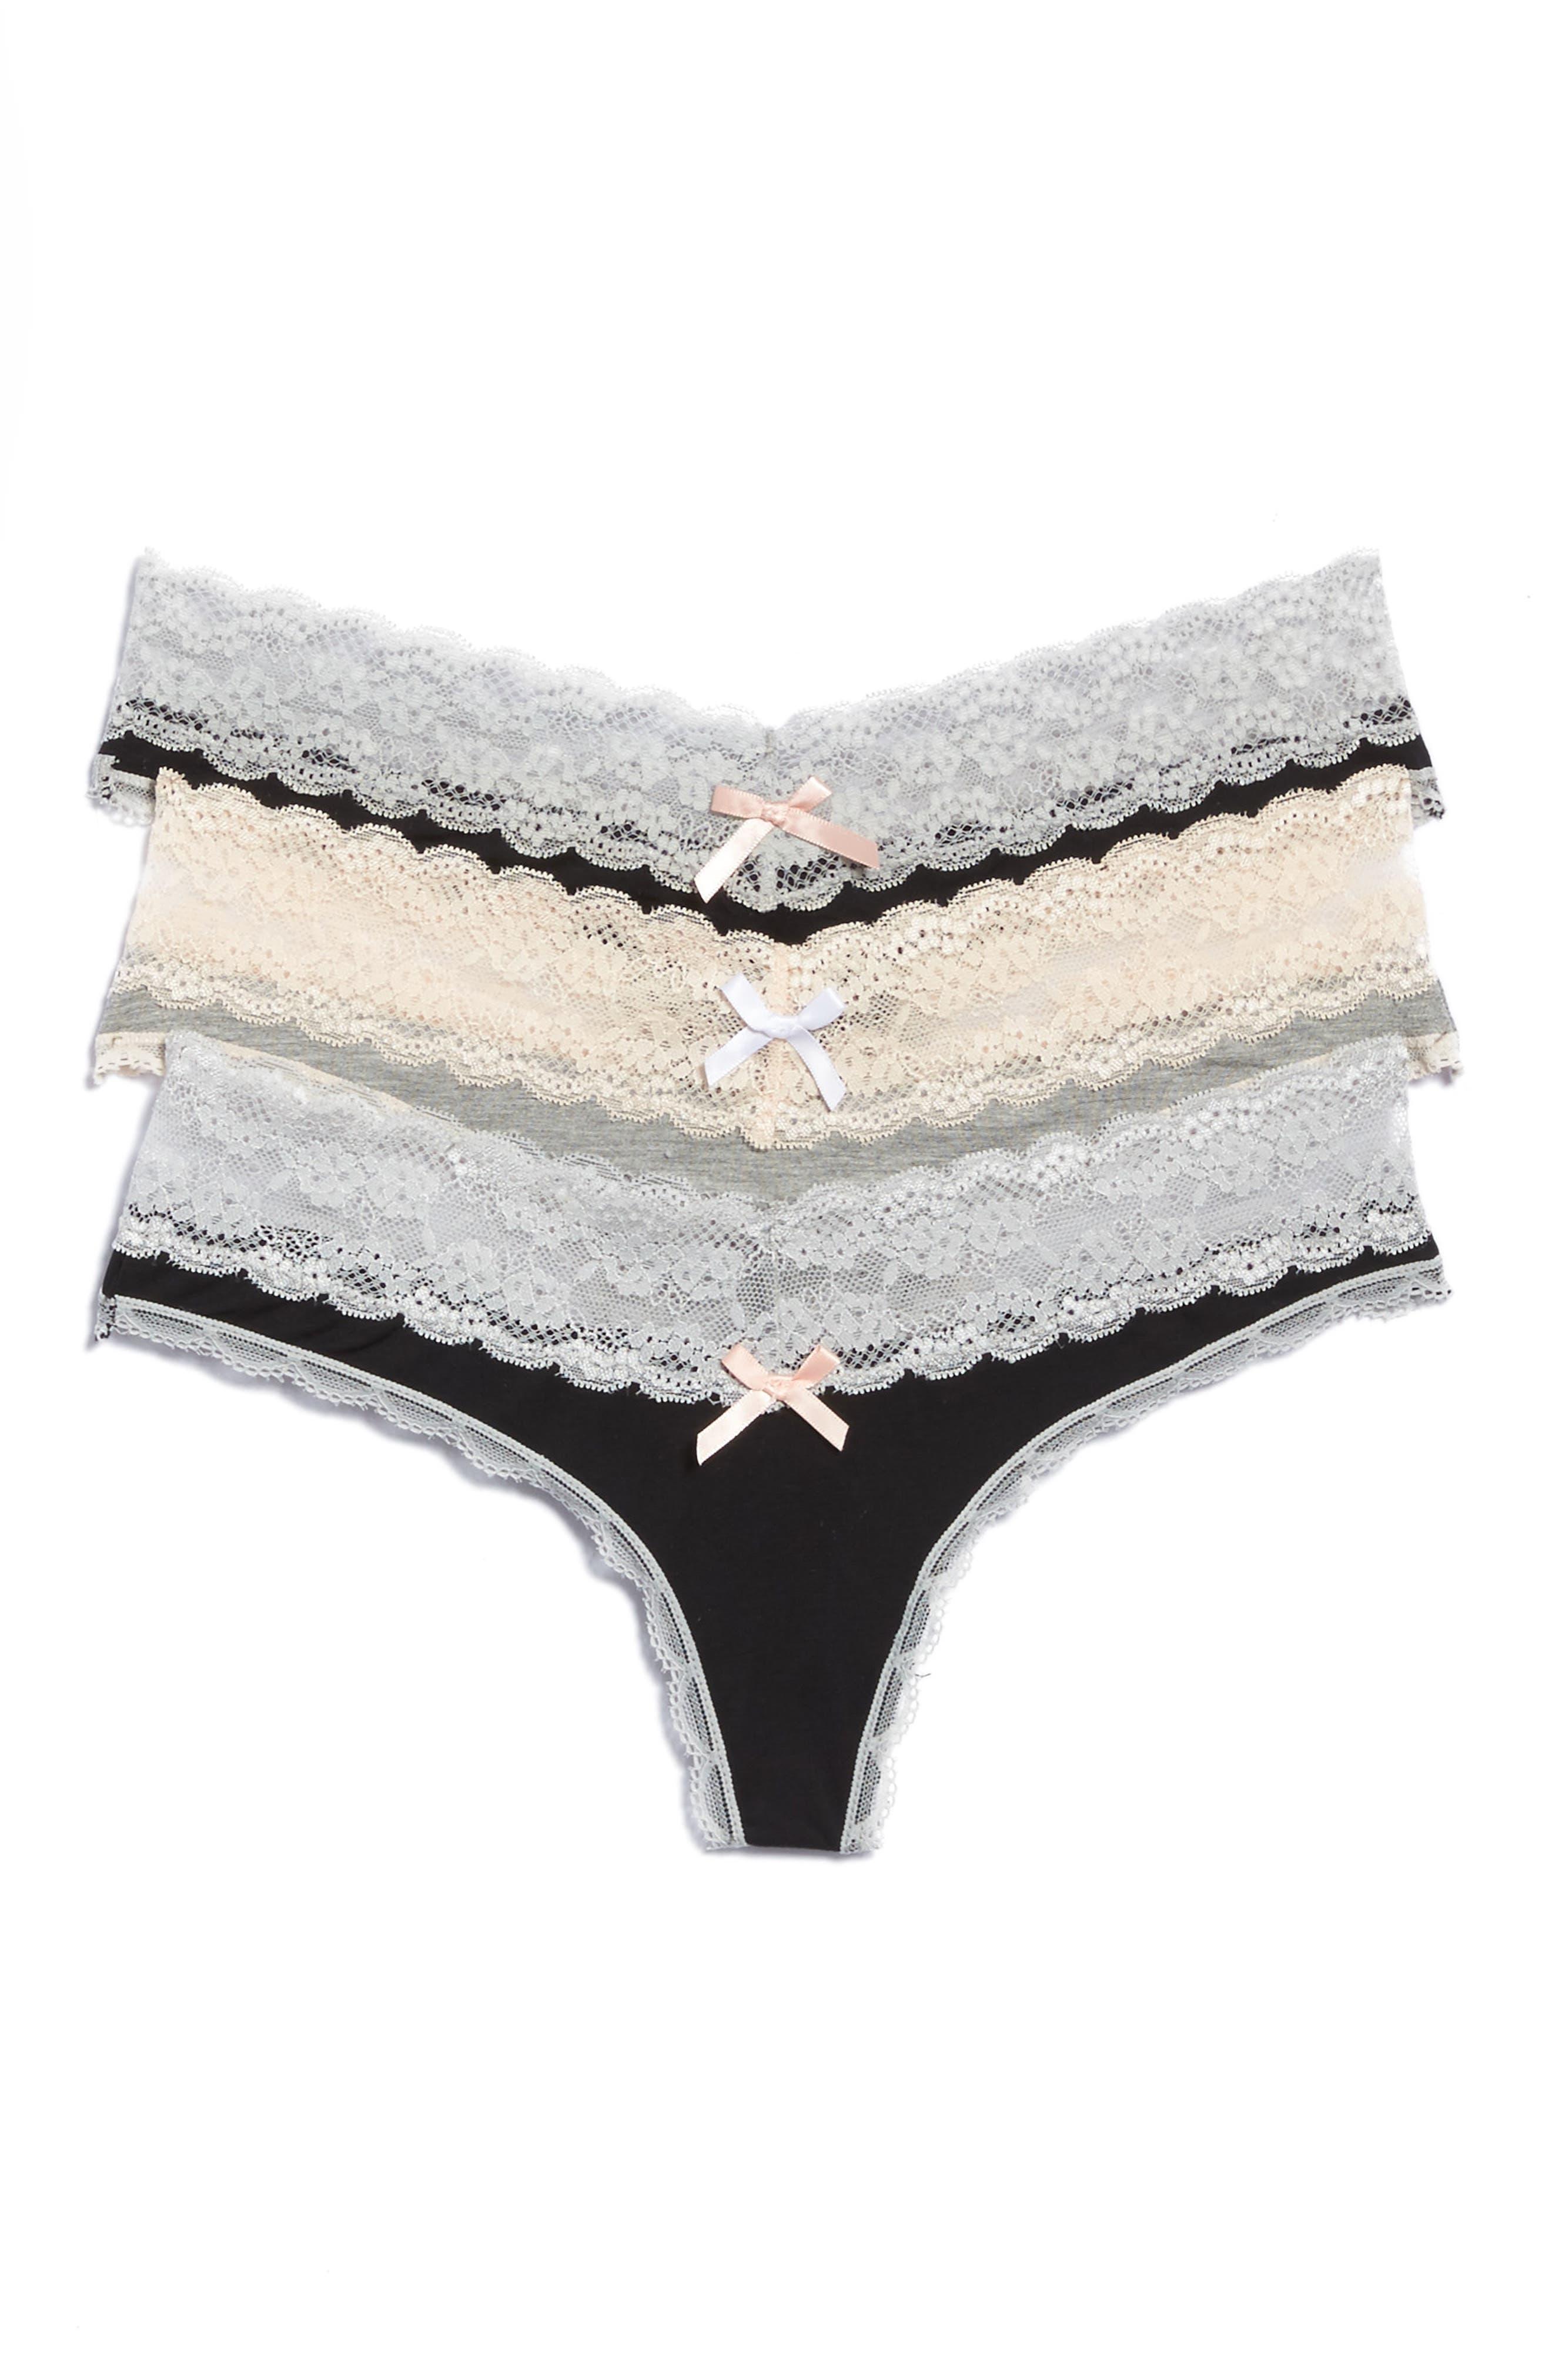 Ahna 3-Pack Lace Thong,                             Main thumbnail 1, color,                             BLACK/ HEATHER GREY/ BLACK